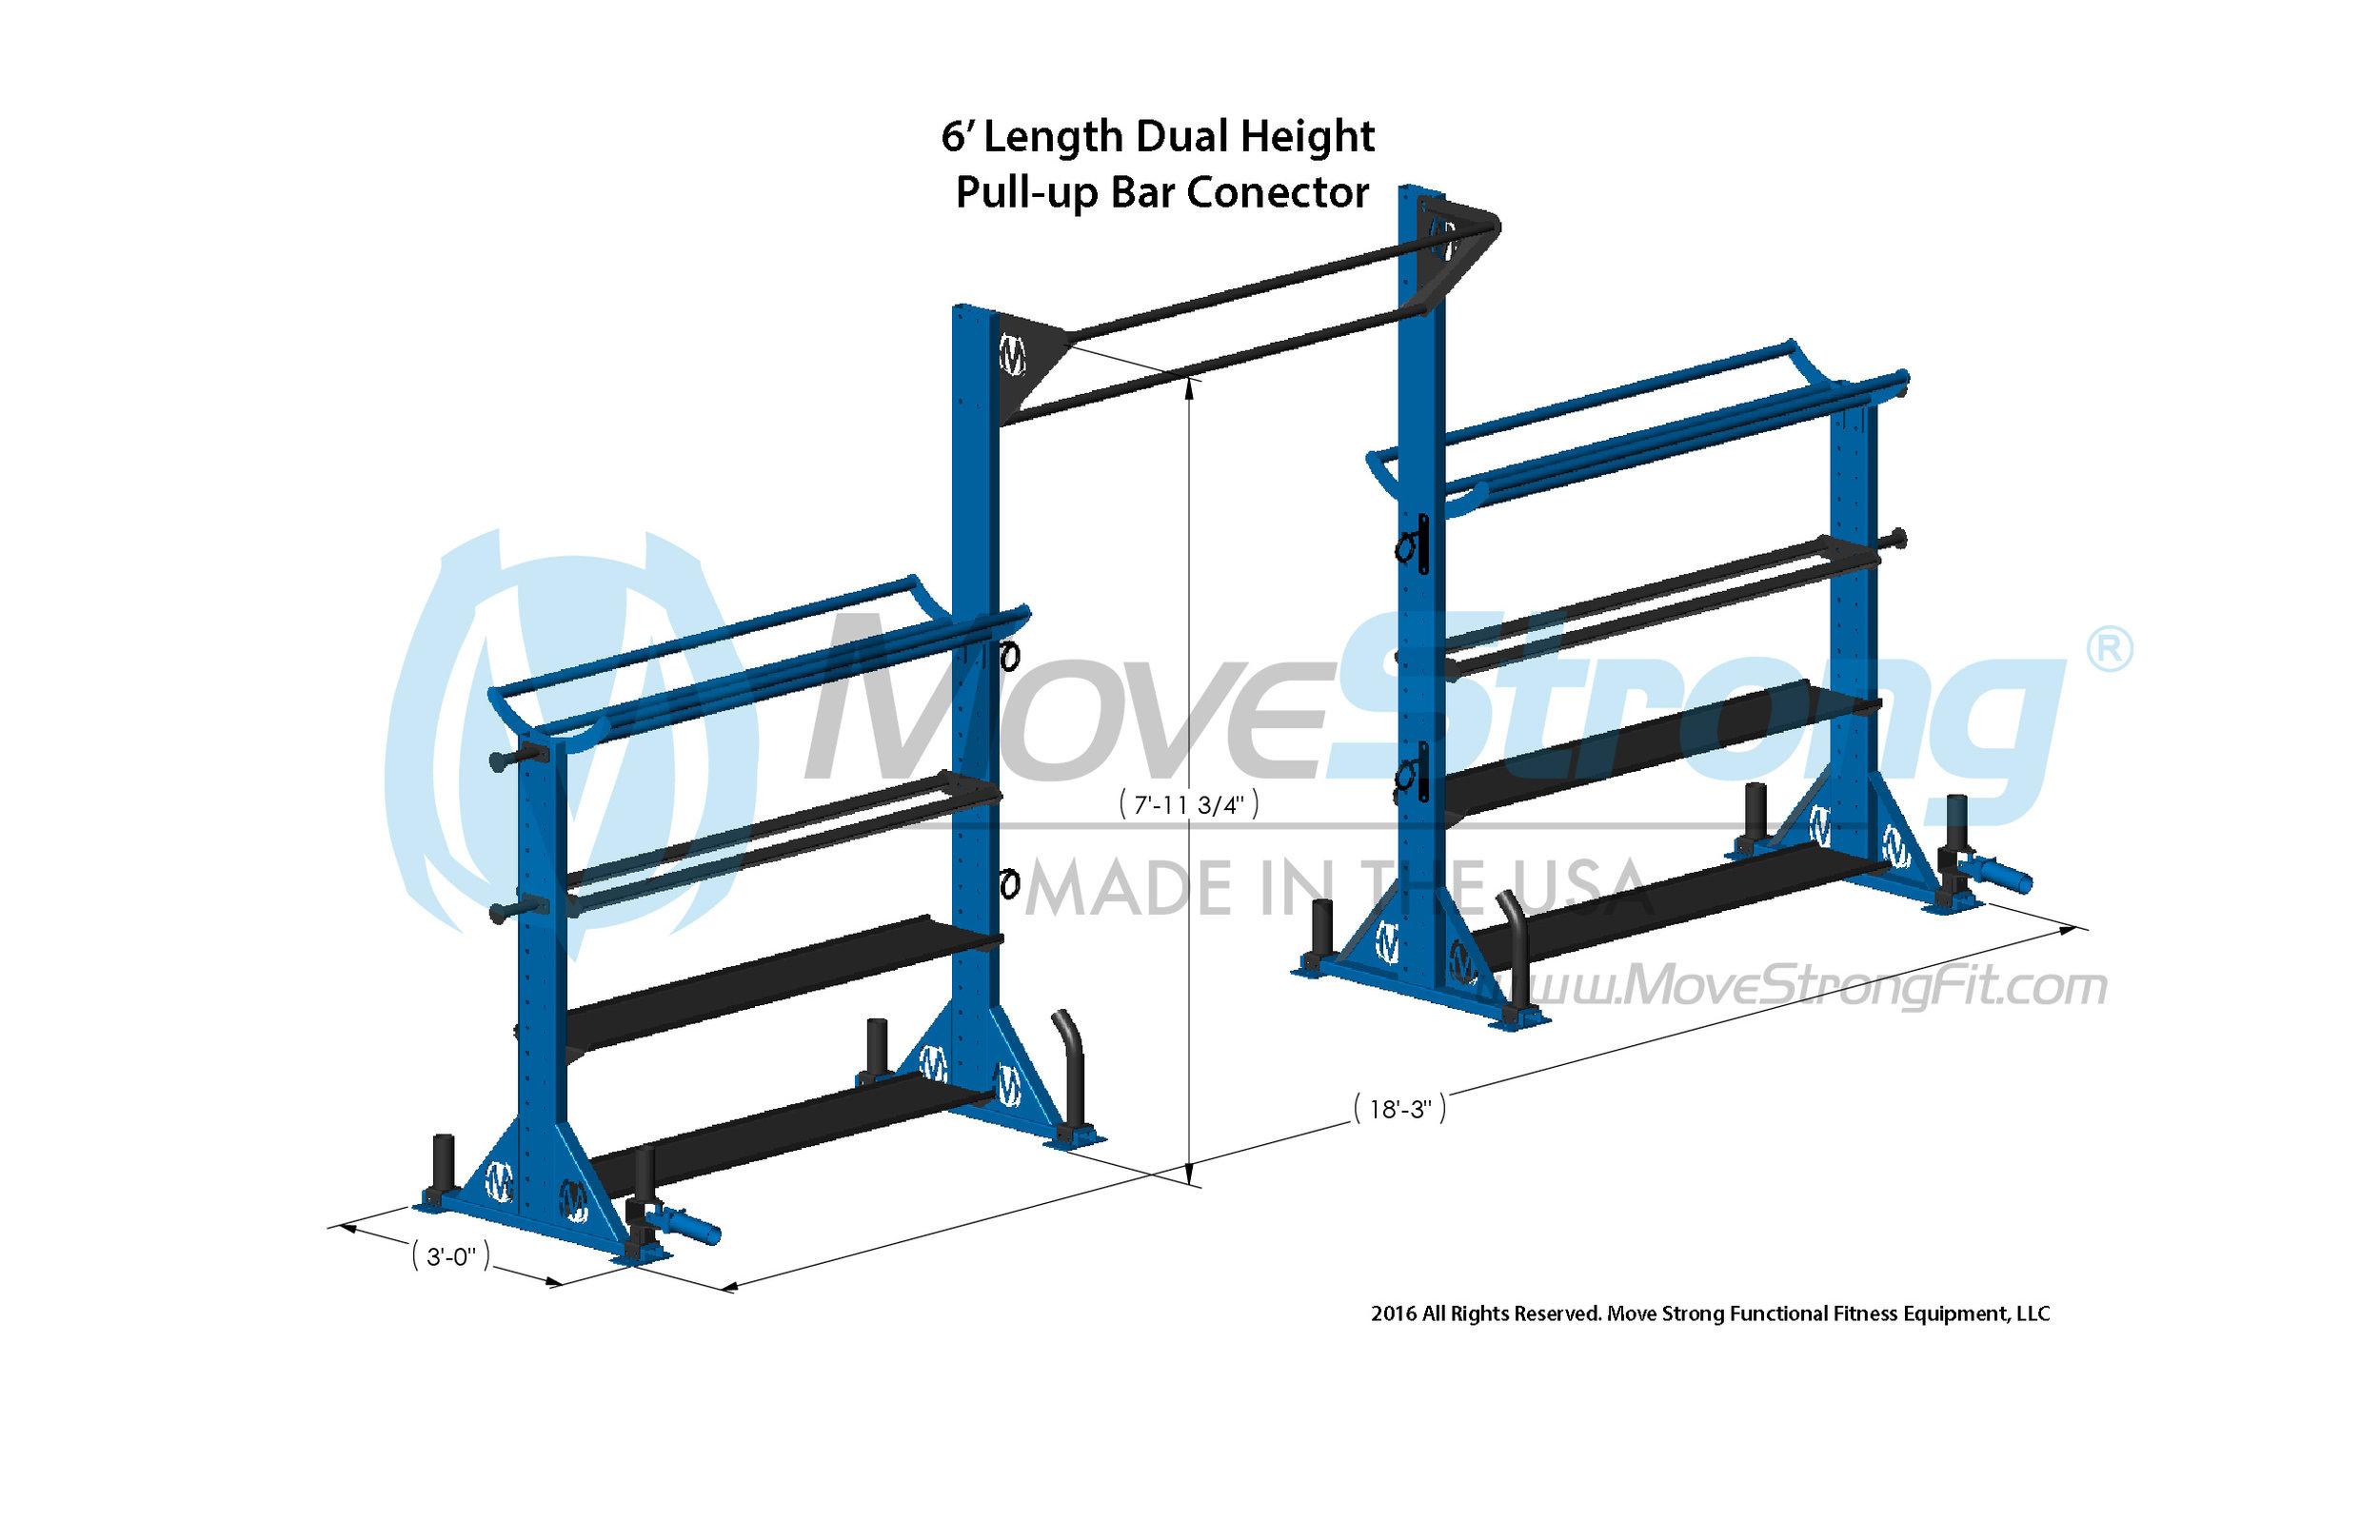 WEB IMAGE_MSR-155 Dual Elite Storage 8ft Uprights_rendering_Specs_FINAL 2-14-16.jpg